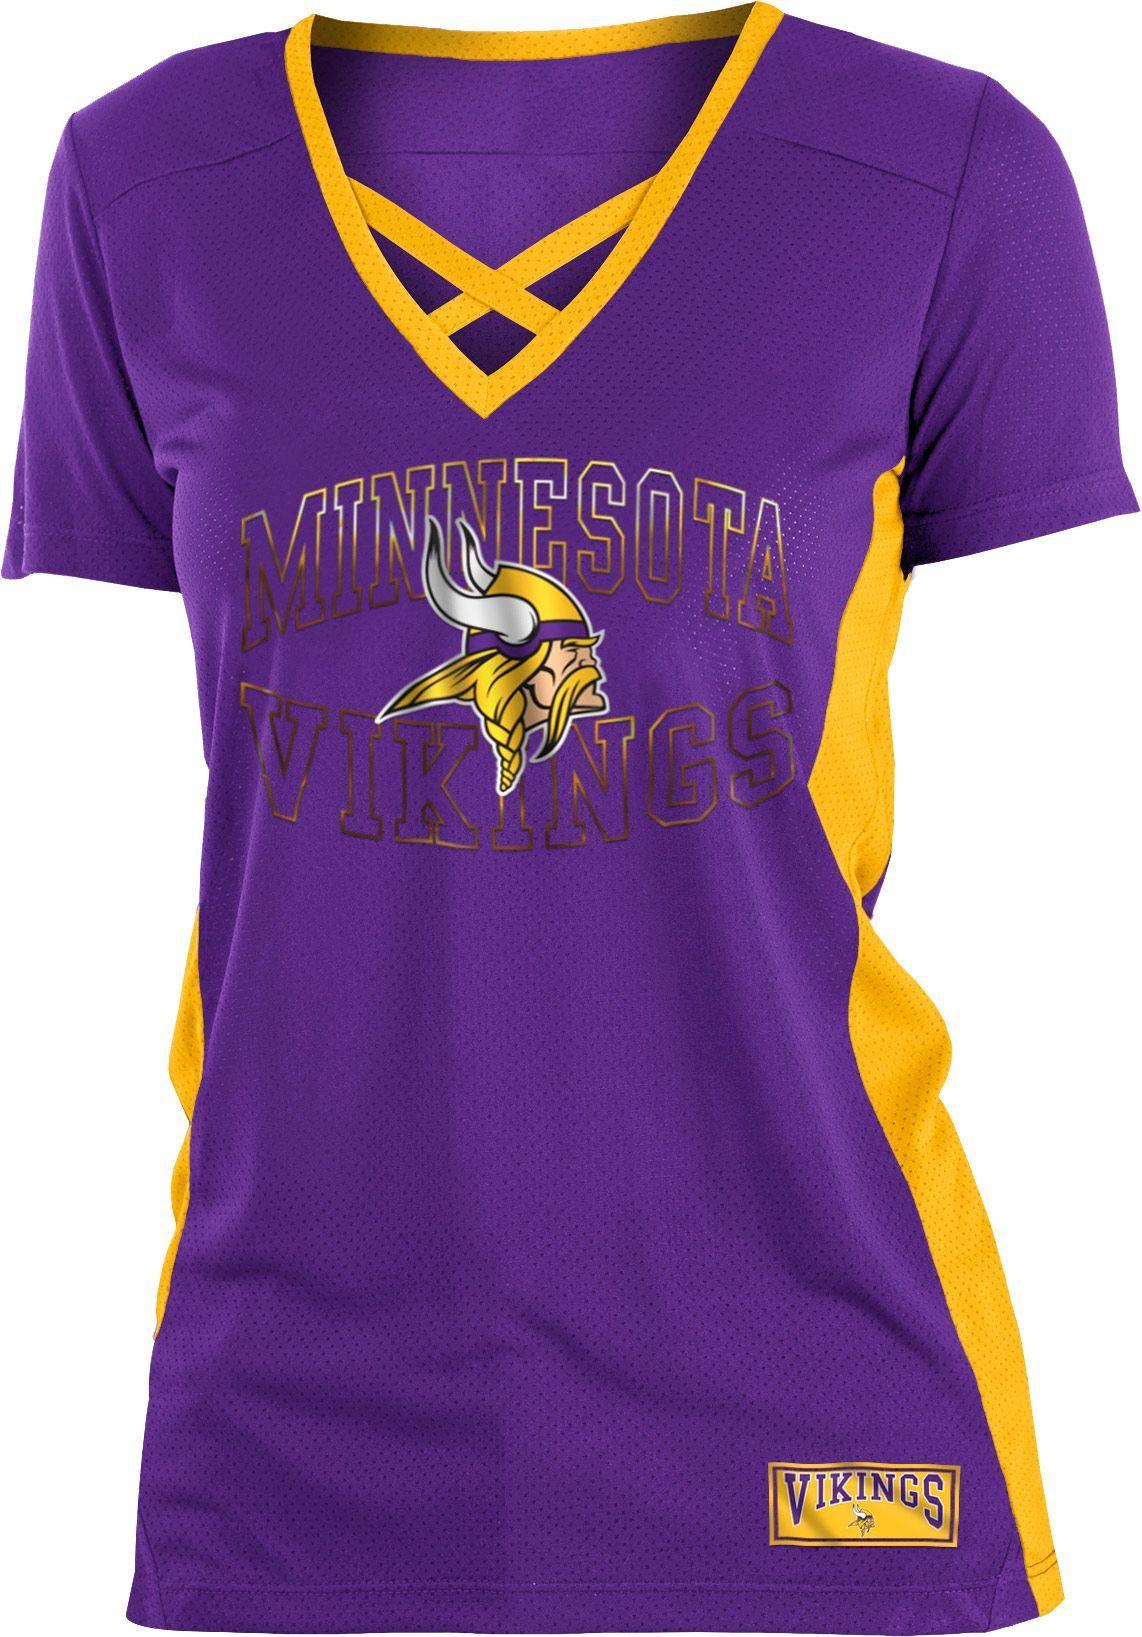 buy online 40f9f 9dbc1 Team Apparel Women's Minnesota Mesh Lace T-Shirt, Size ...